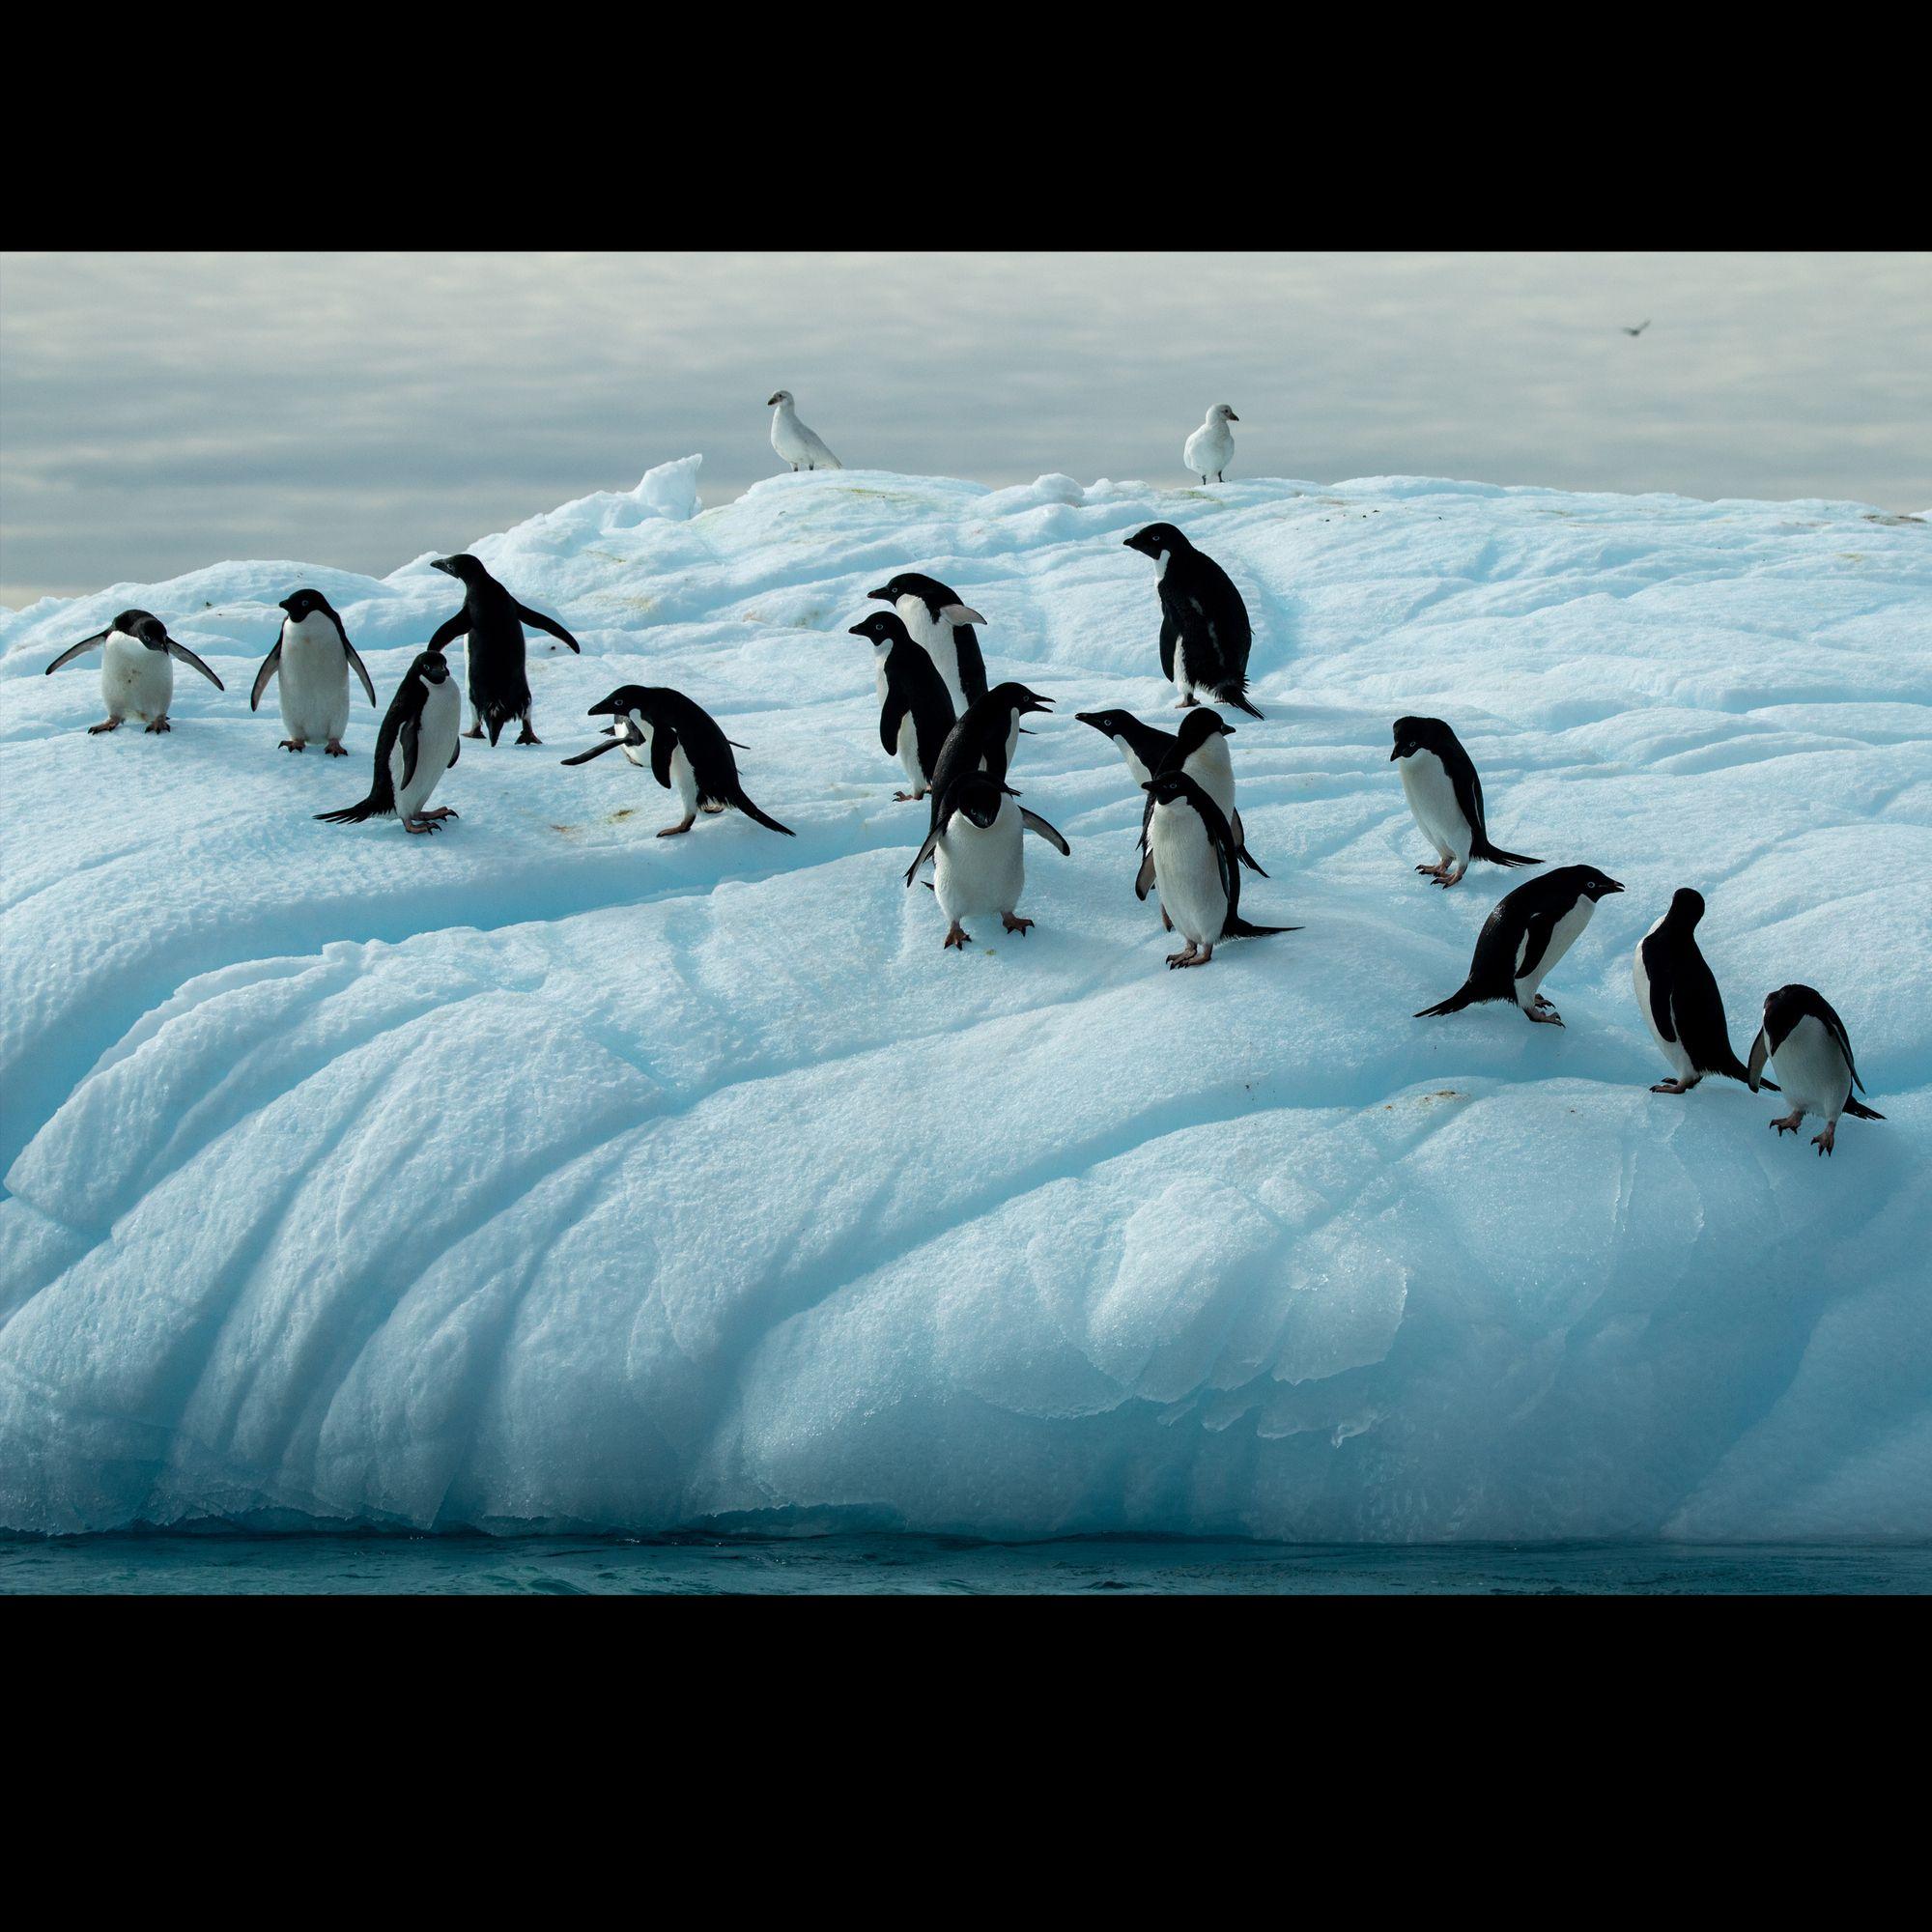 Adelies on an iceflow!!!!  . #challengeyourself #greenhillsentertainment #travelphotography #dennisgreenhillphotography #nationalgeographic #lindbladexpeditions #artandsoul #expeditionphotography #saveourplanet #instabirds #yourshotphotographer #penguins #adelie #wildlifephotography #antarctica #iceberg #zodiacboats #expeditiontravel